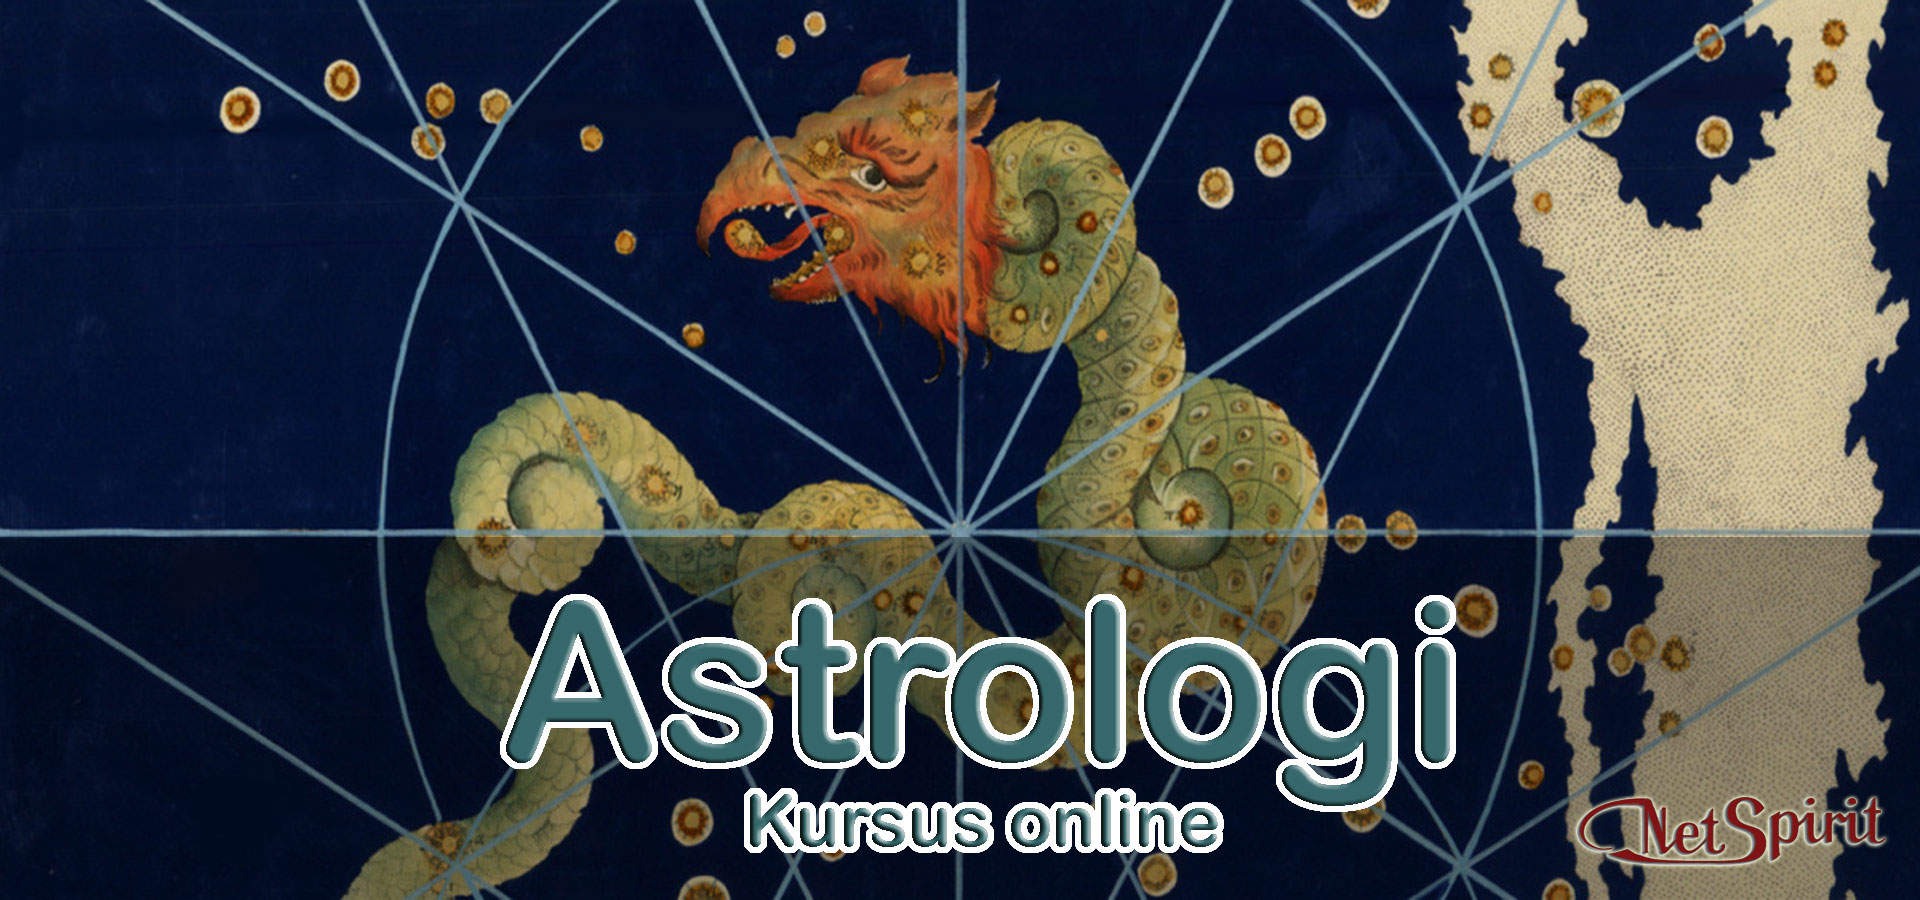 kursus astrologi - Kursus online   Astrologi